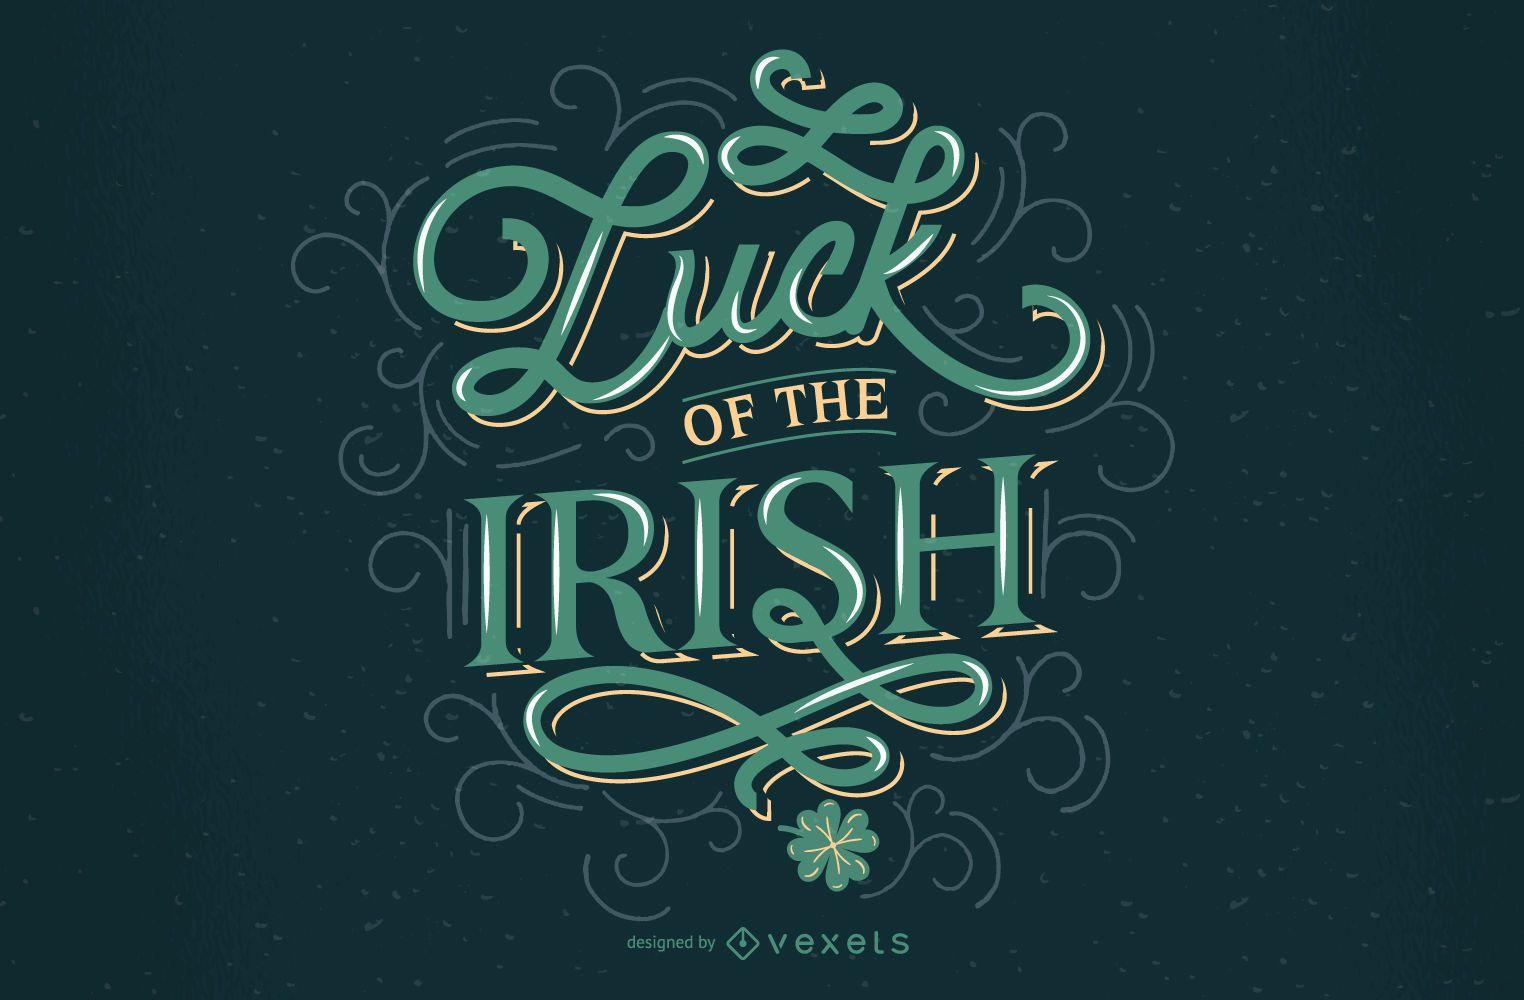 Diseño de letras irlandés suerte st patricks